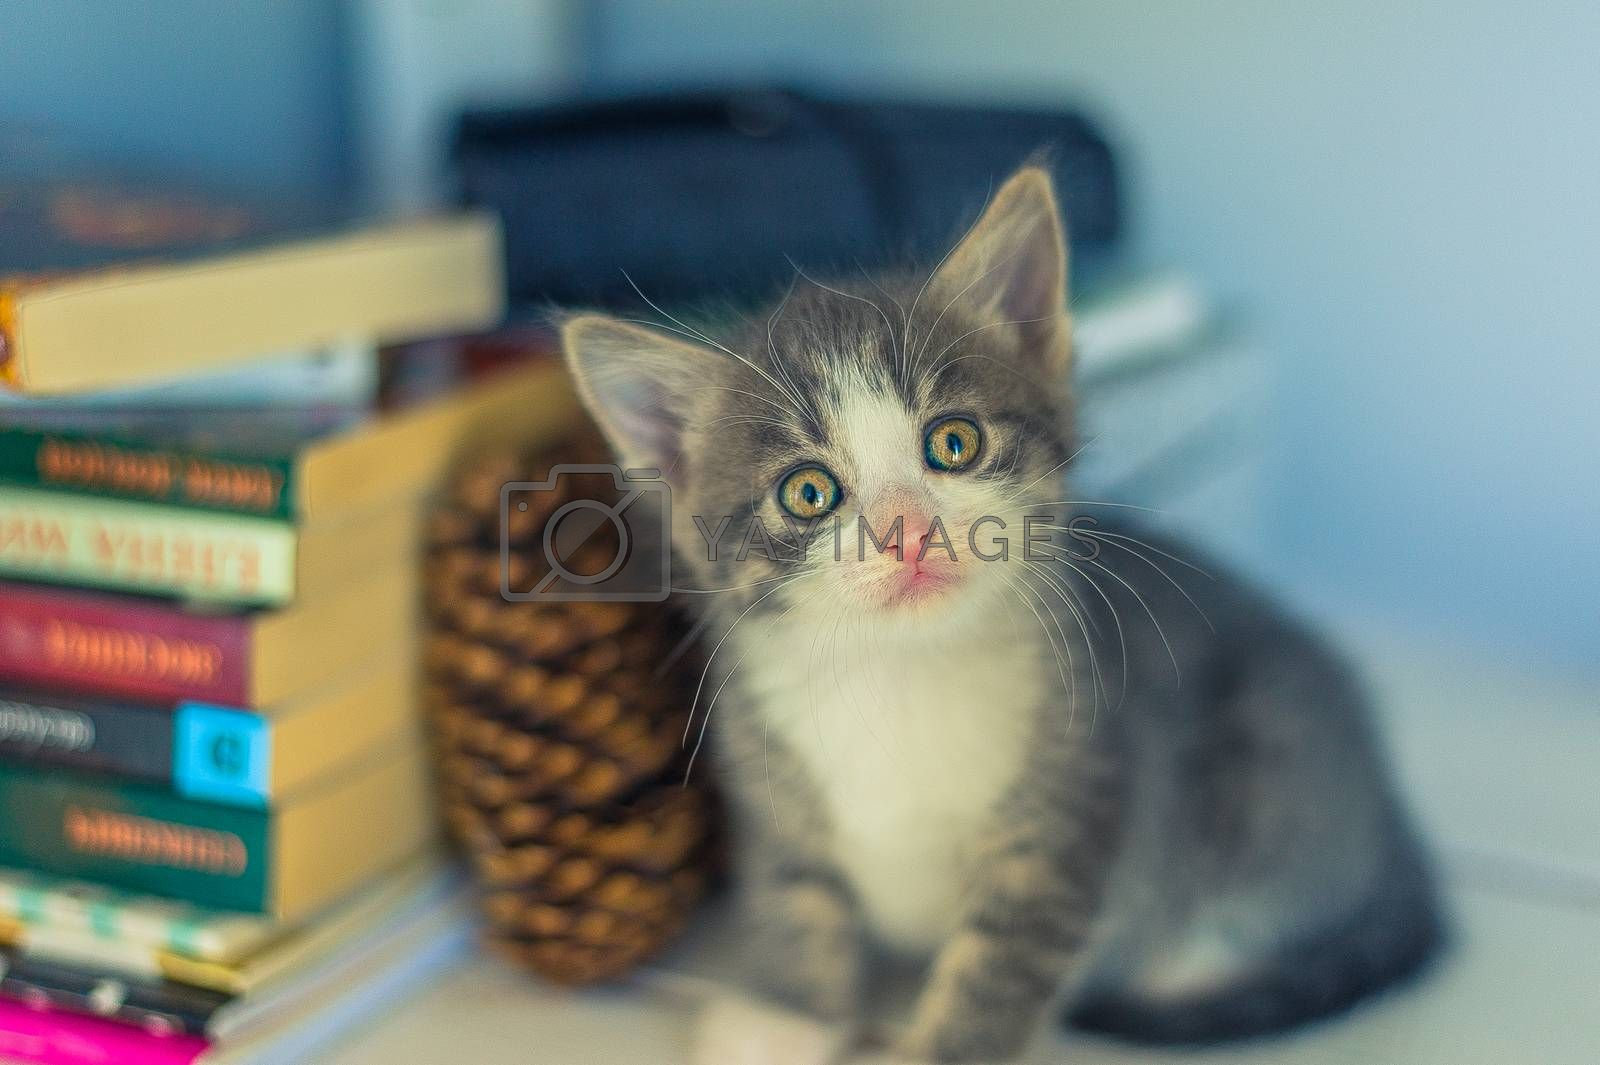 Gray kitten sits near books and fir cones